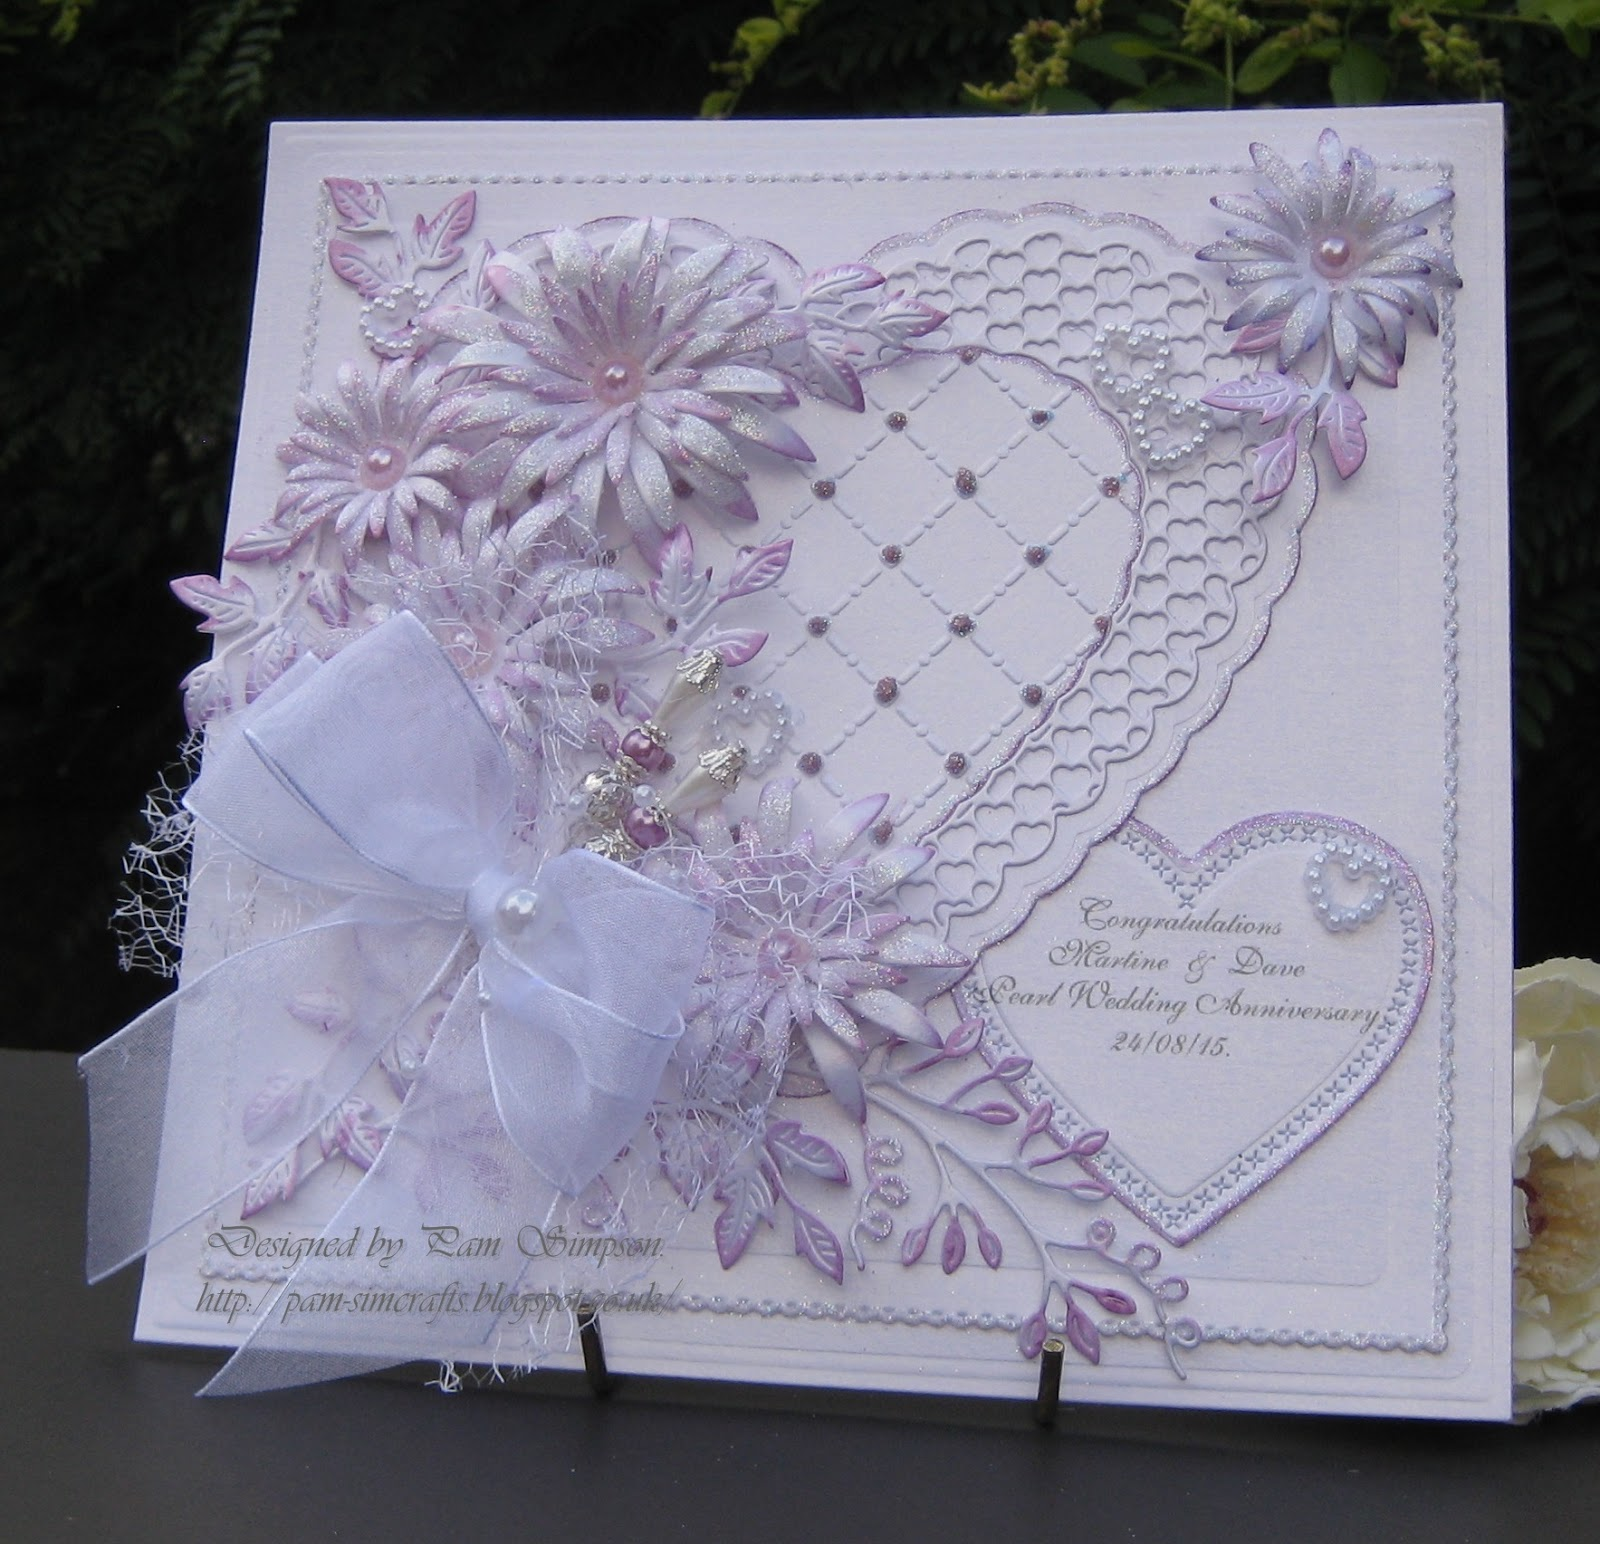 Friends Pearl Wedding Anniversary Card